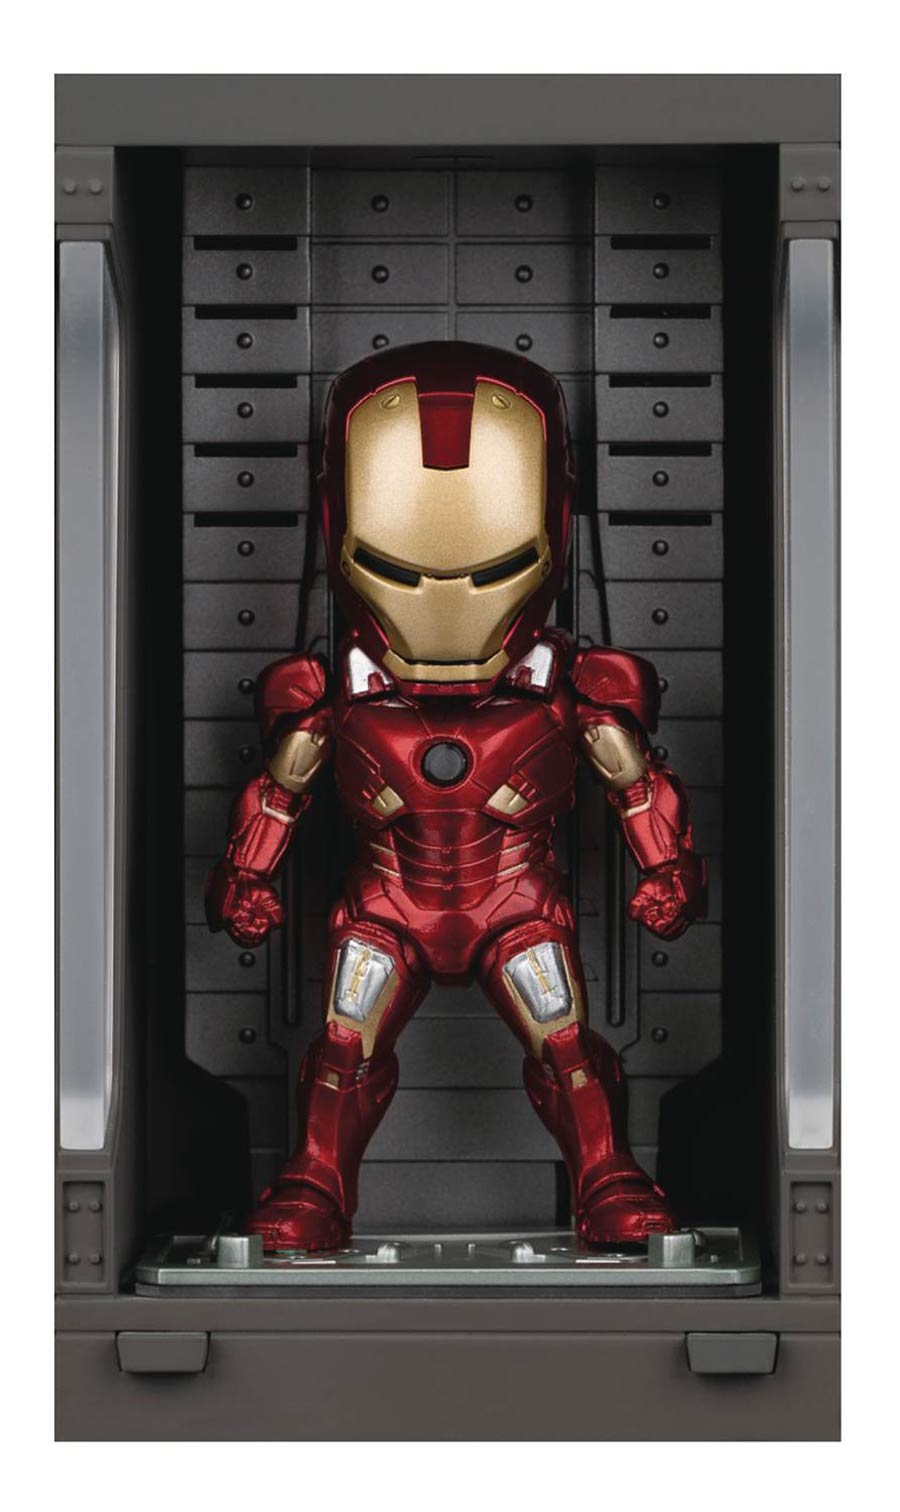 Iron Man 3 MEA-015 Iron Man Mark VII Hall Of Armor Previews Exclusive Figure